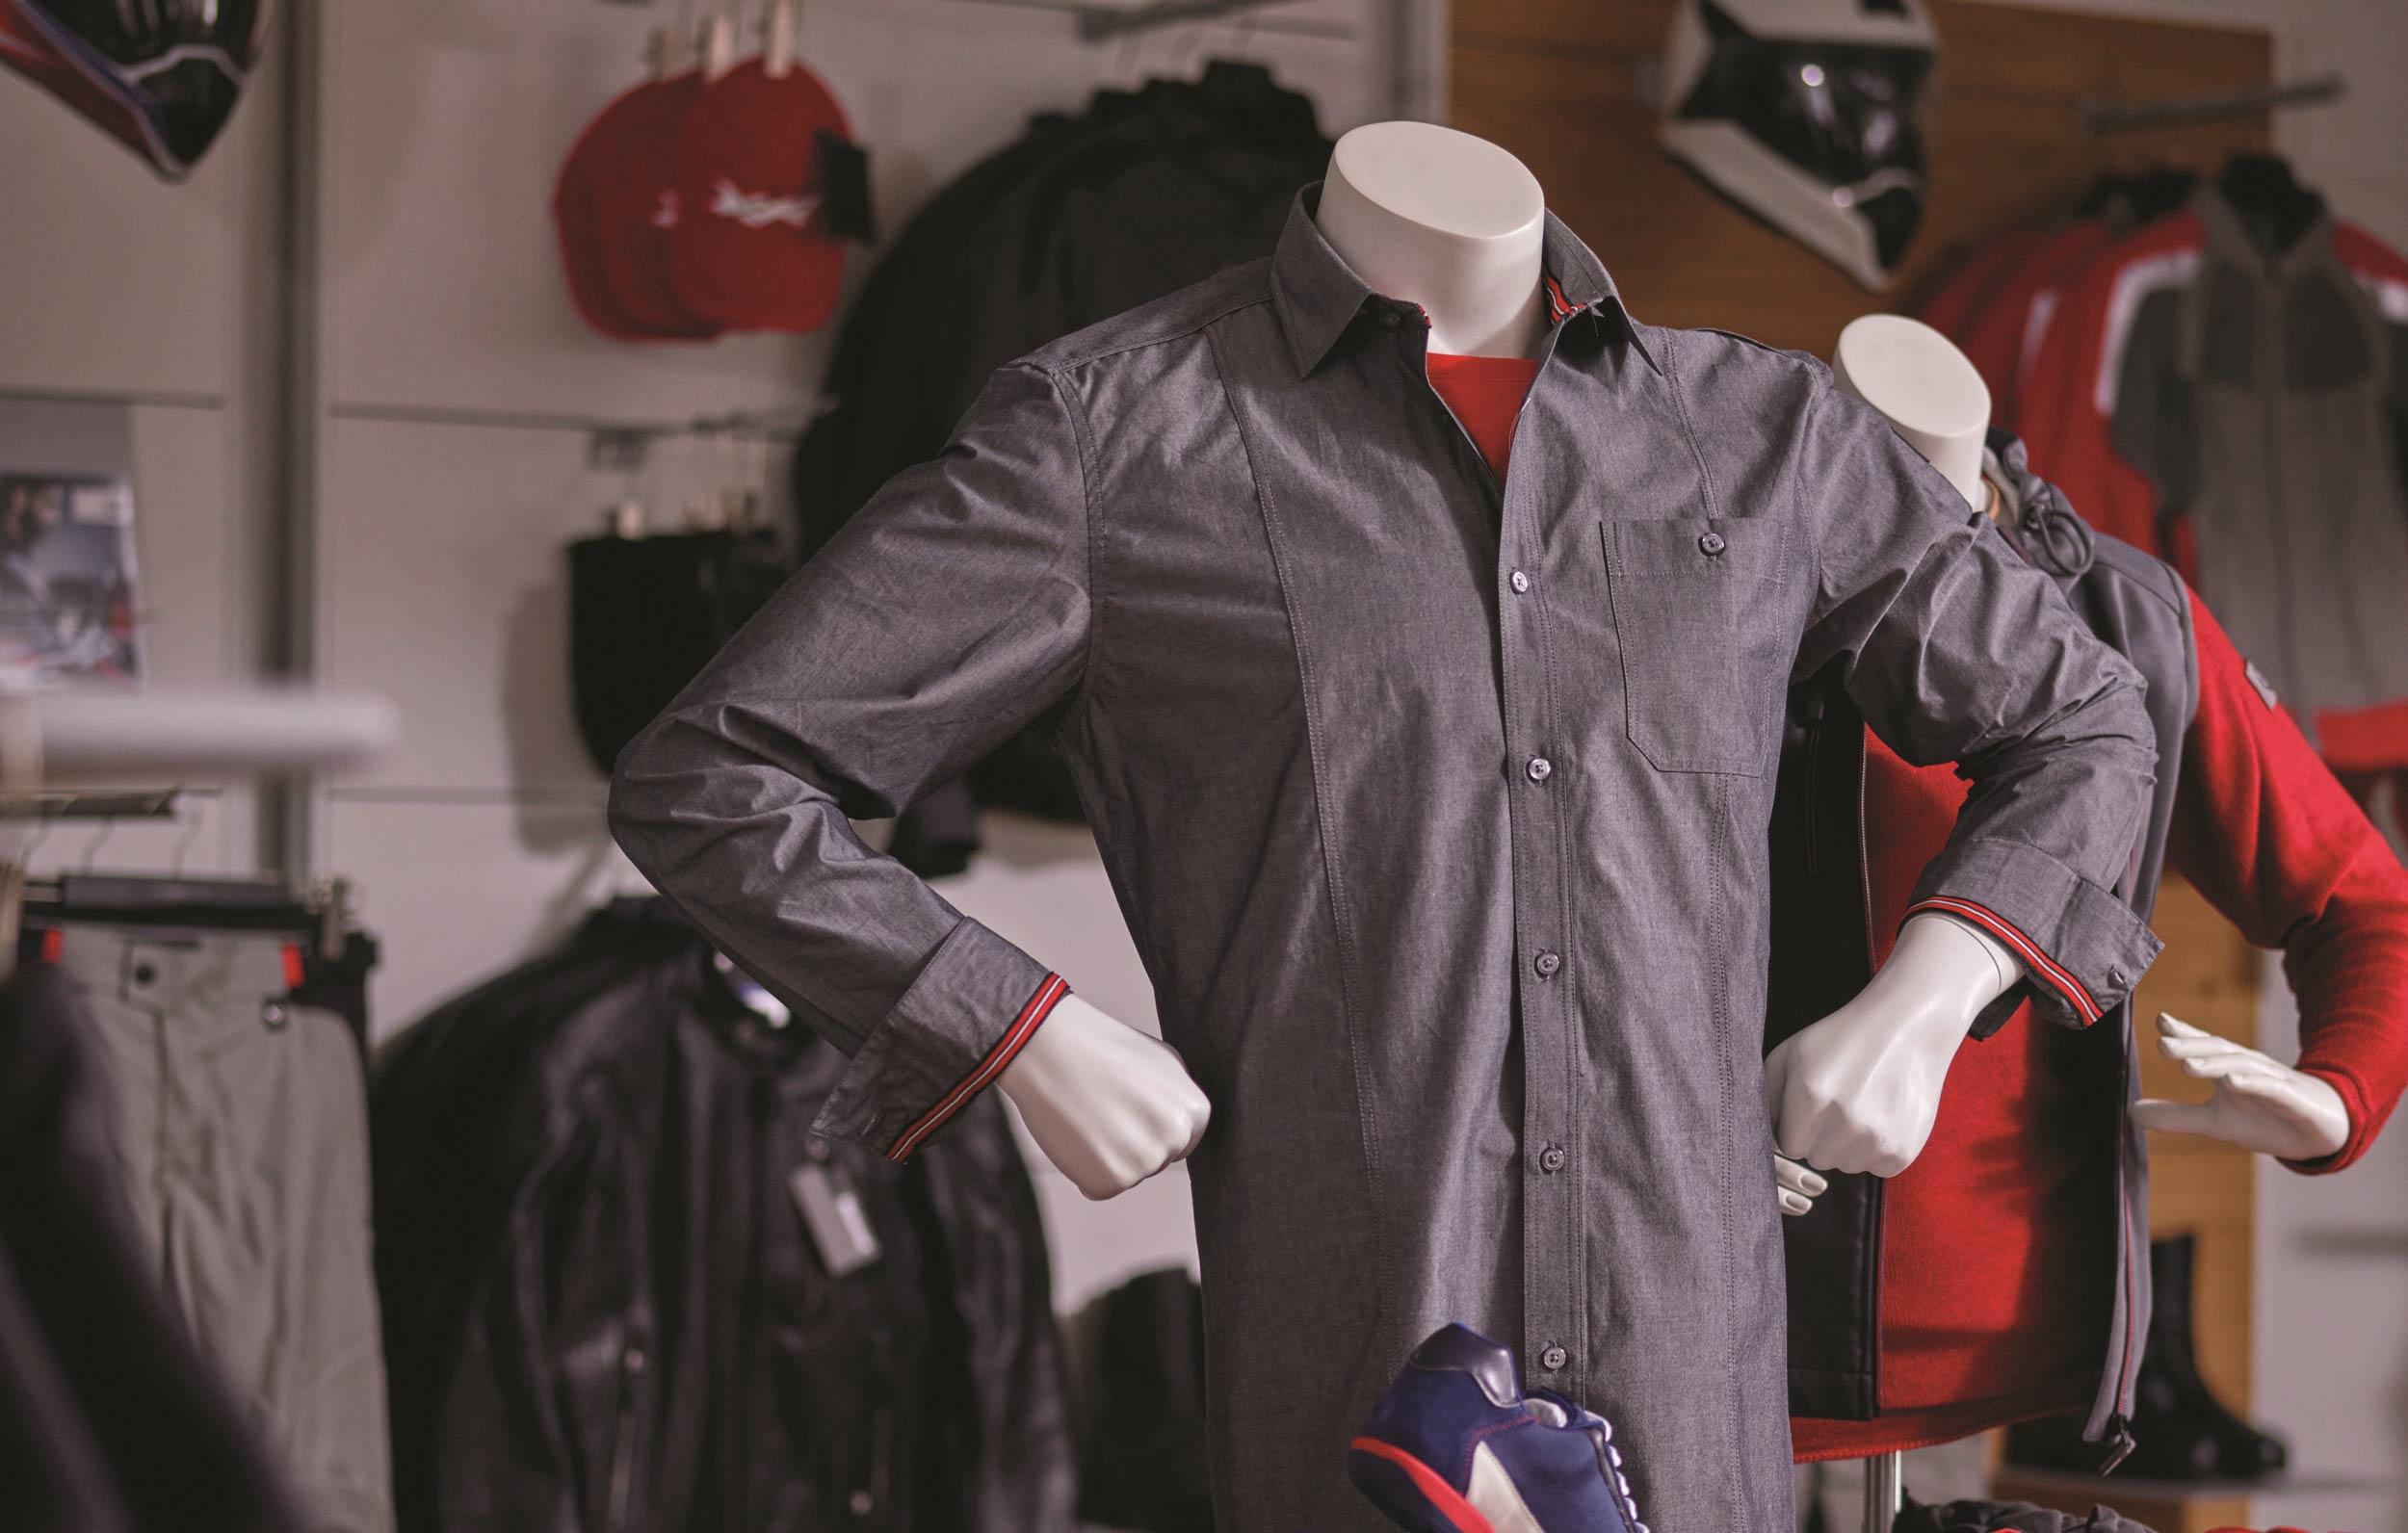 BMW Motorrad In-Store Design Guide & Visual Merchandising